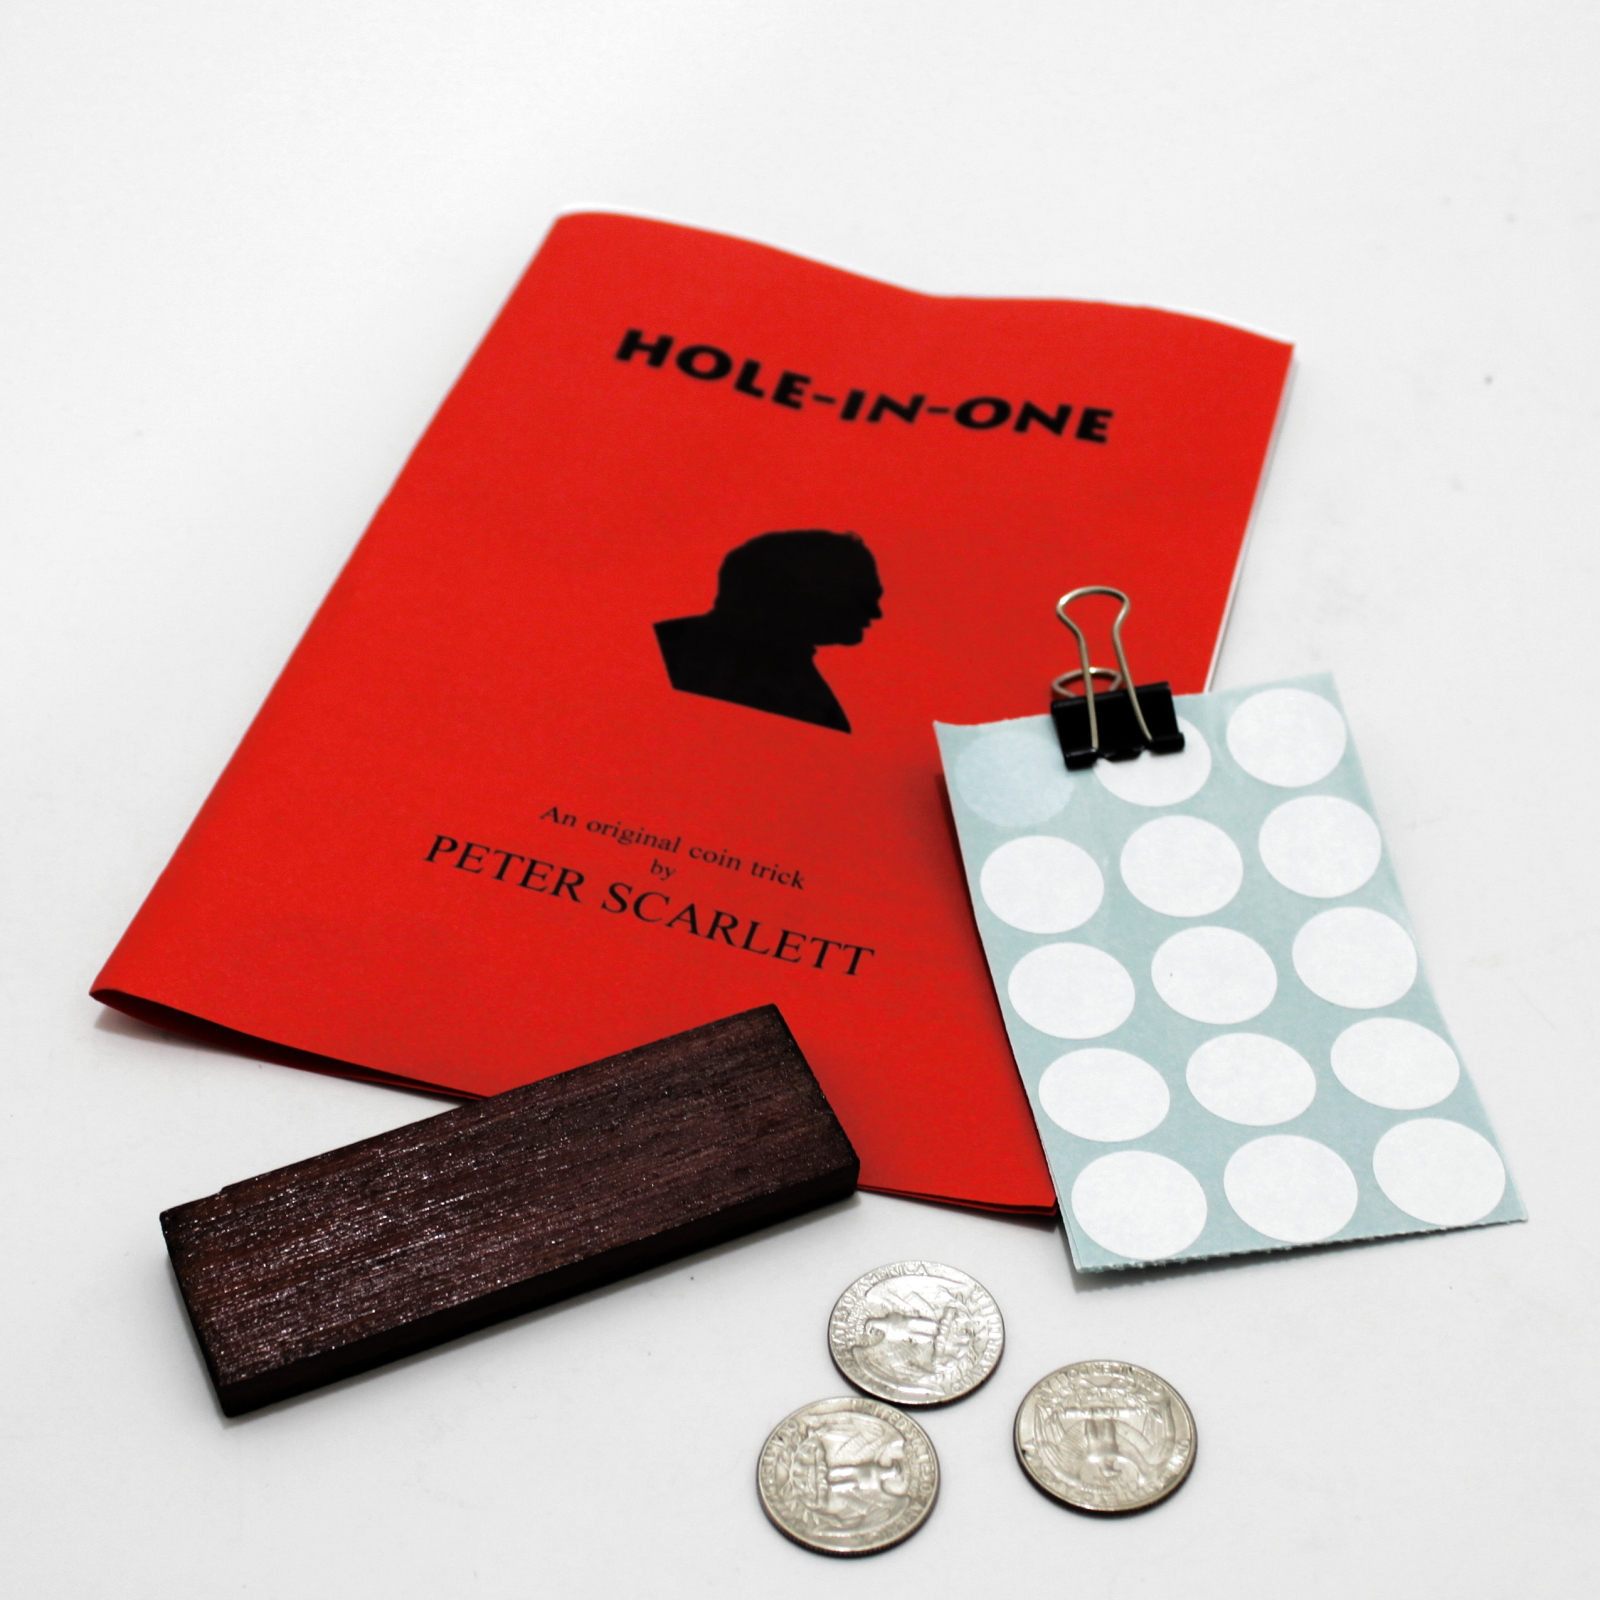 Hole In One (Peter Scarlet) by Peter Scarlett